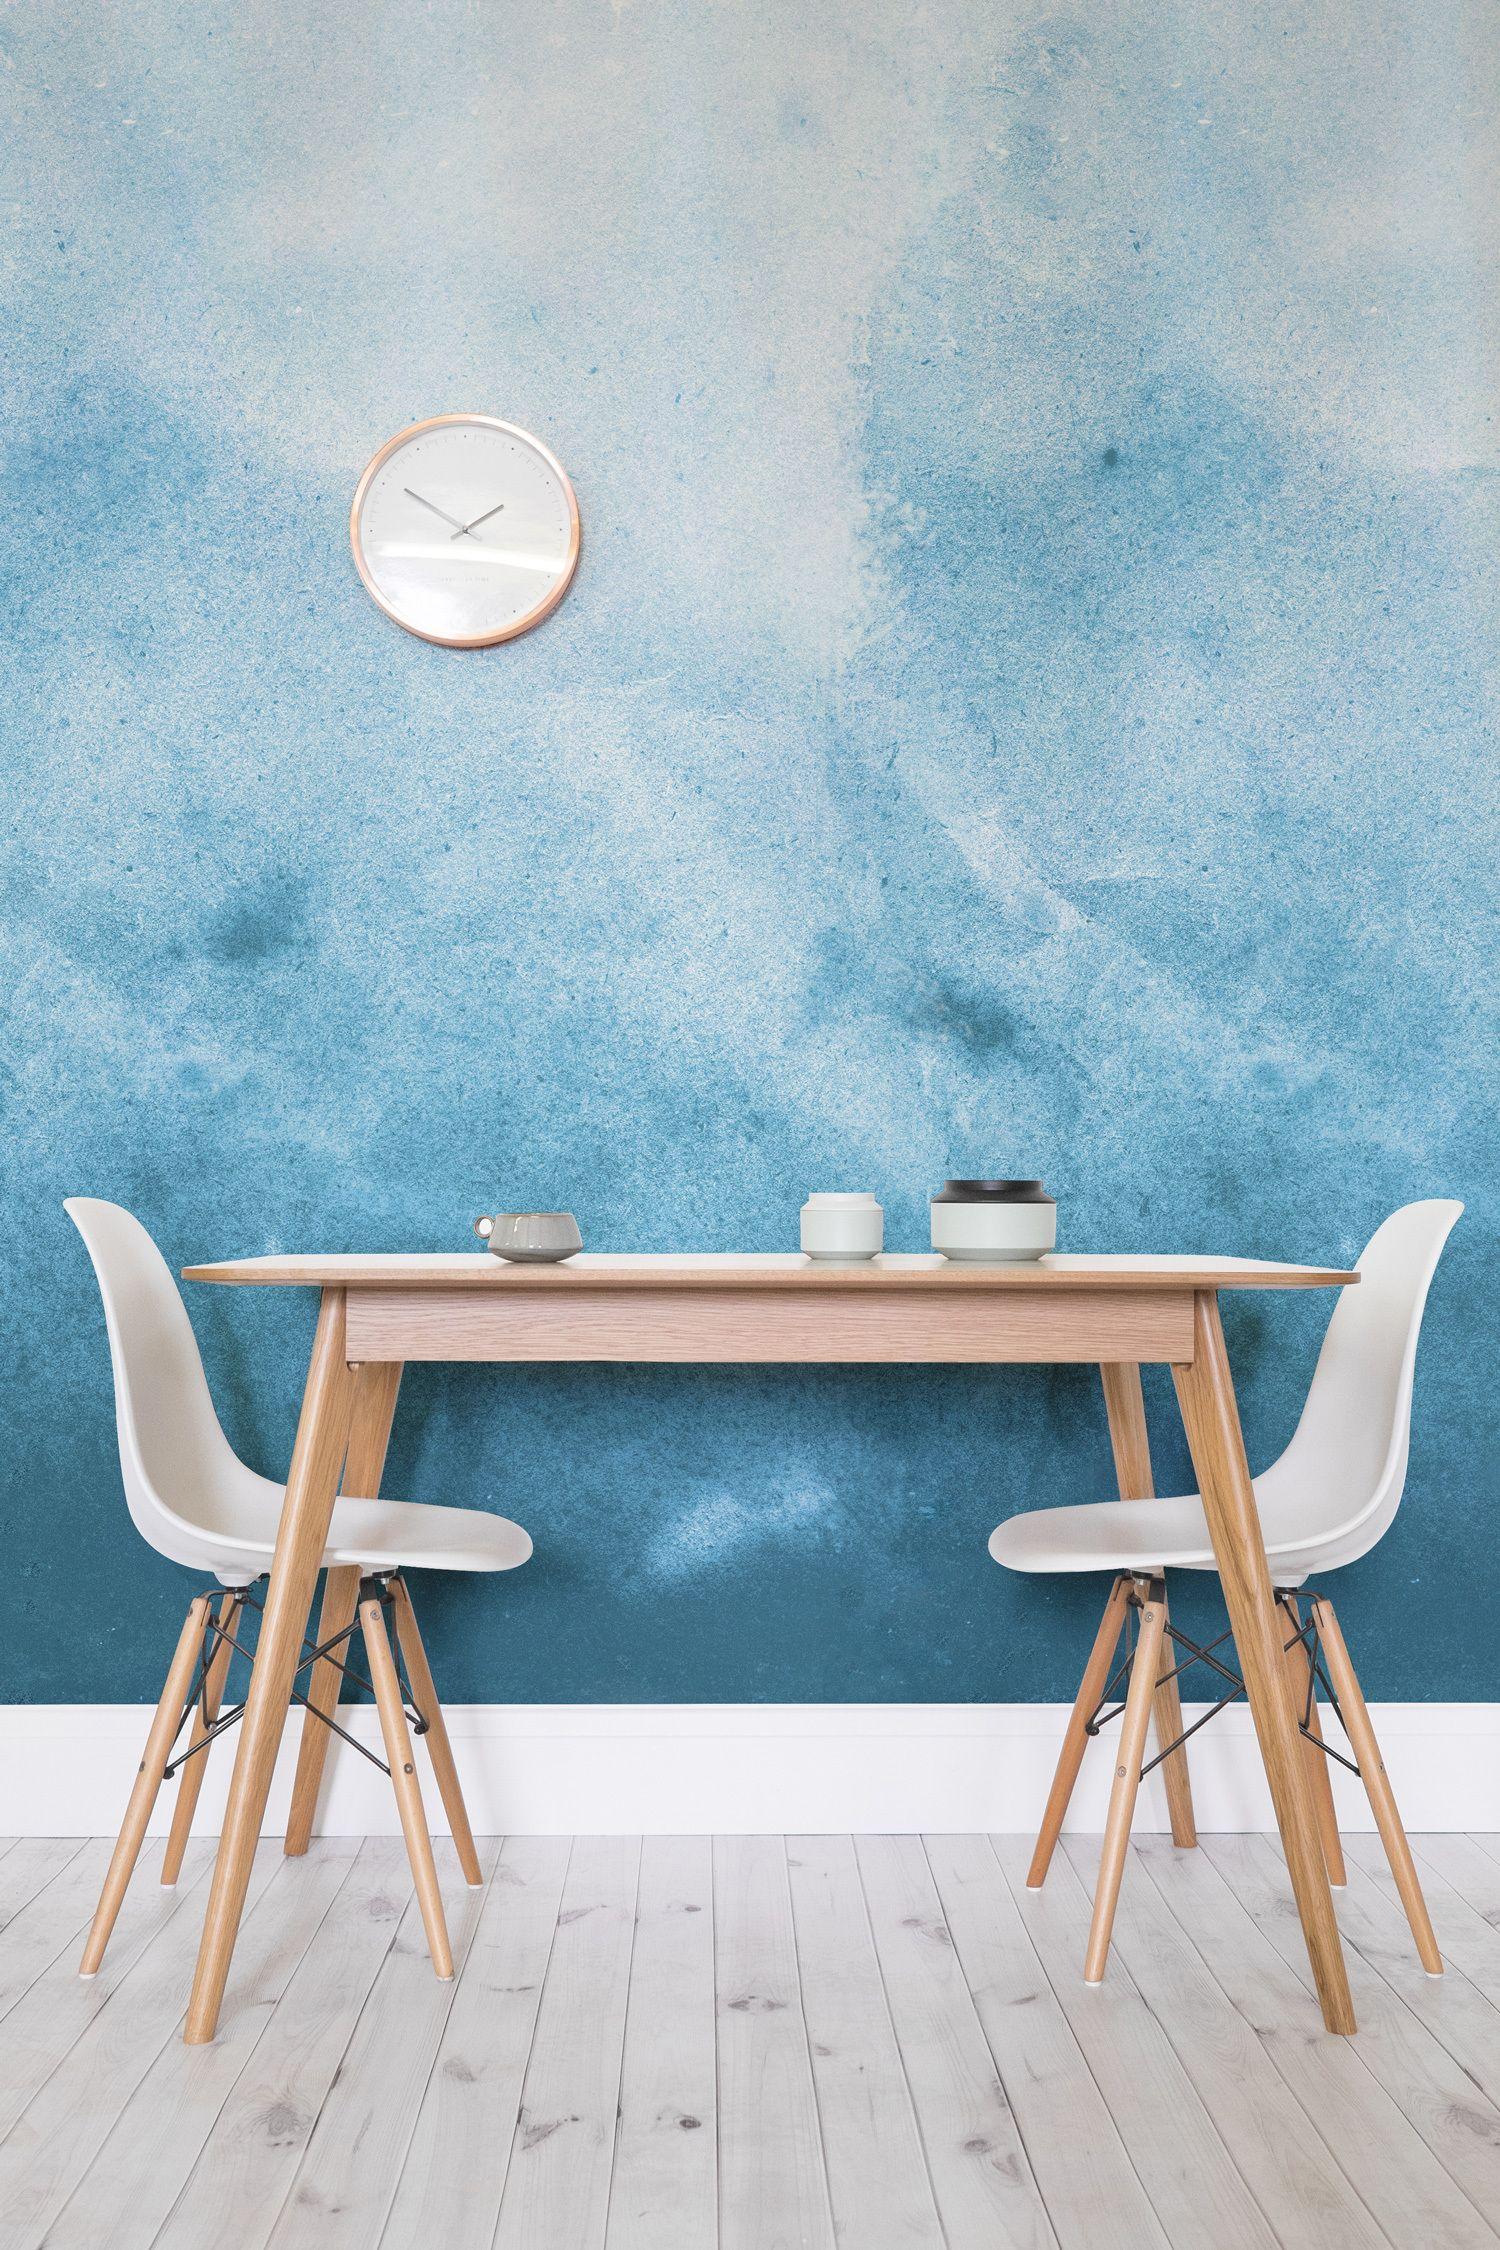 This blue watercolour wallpaper design brings depth